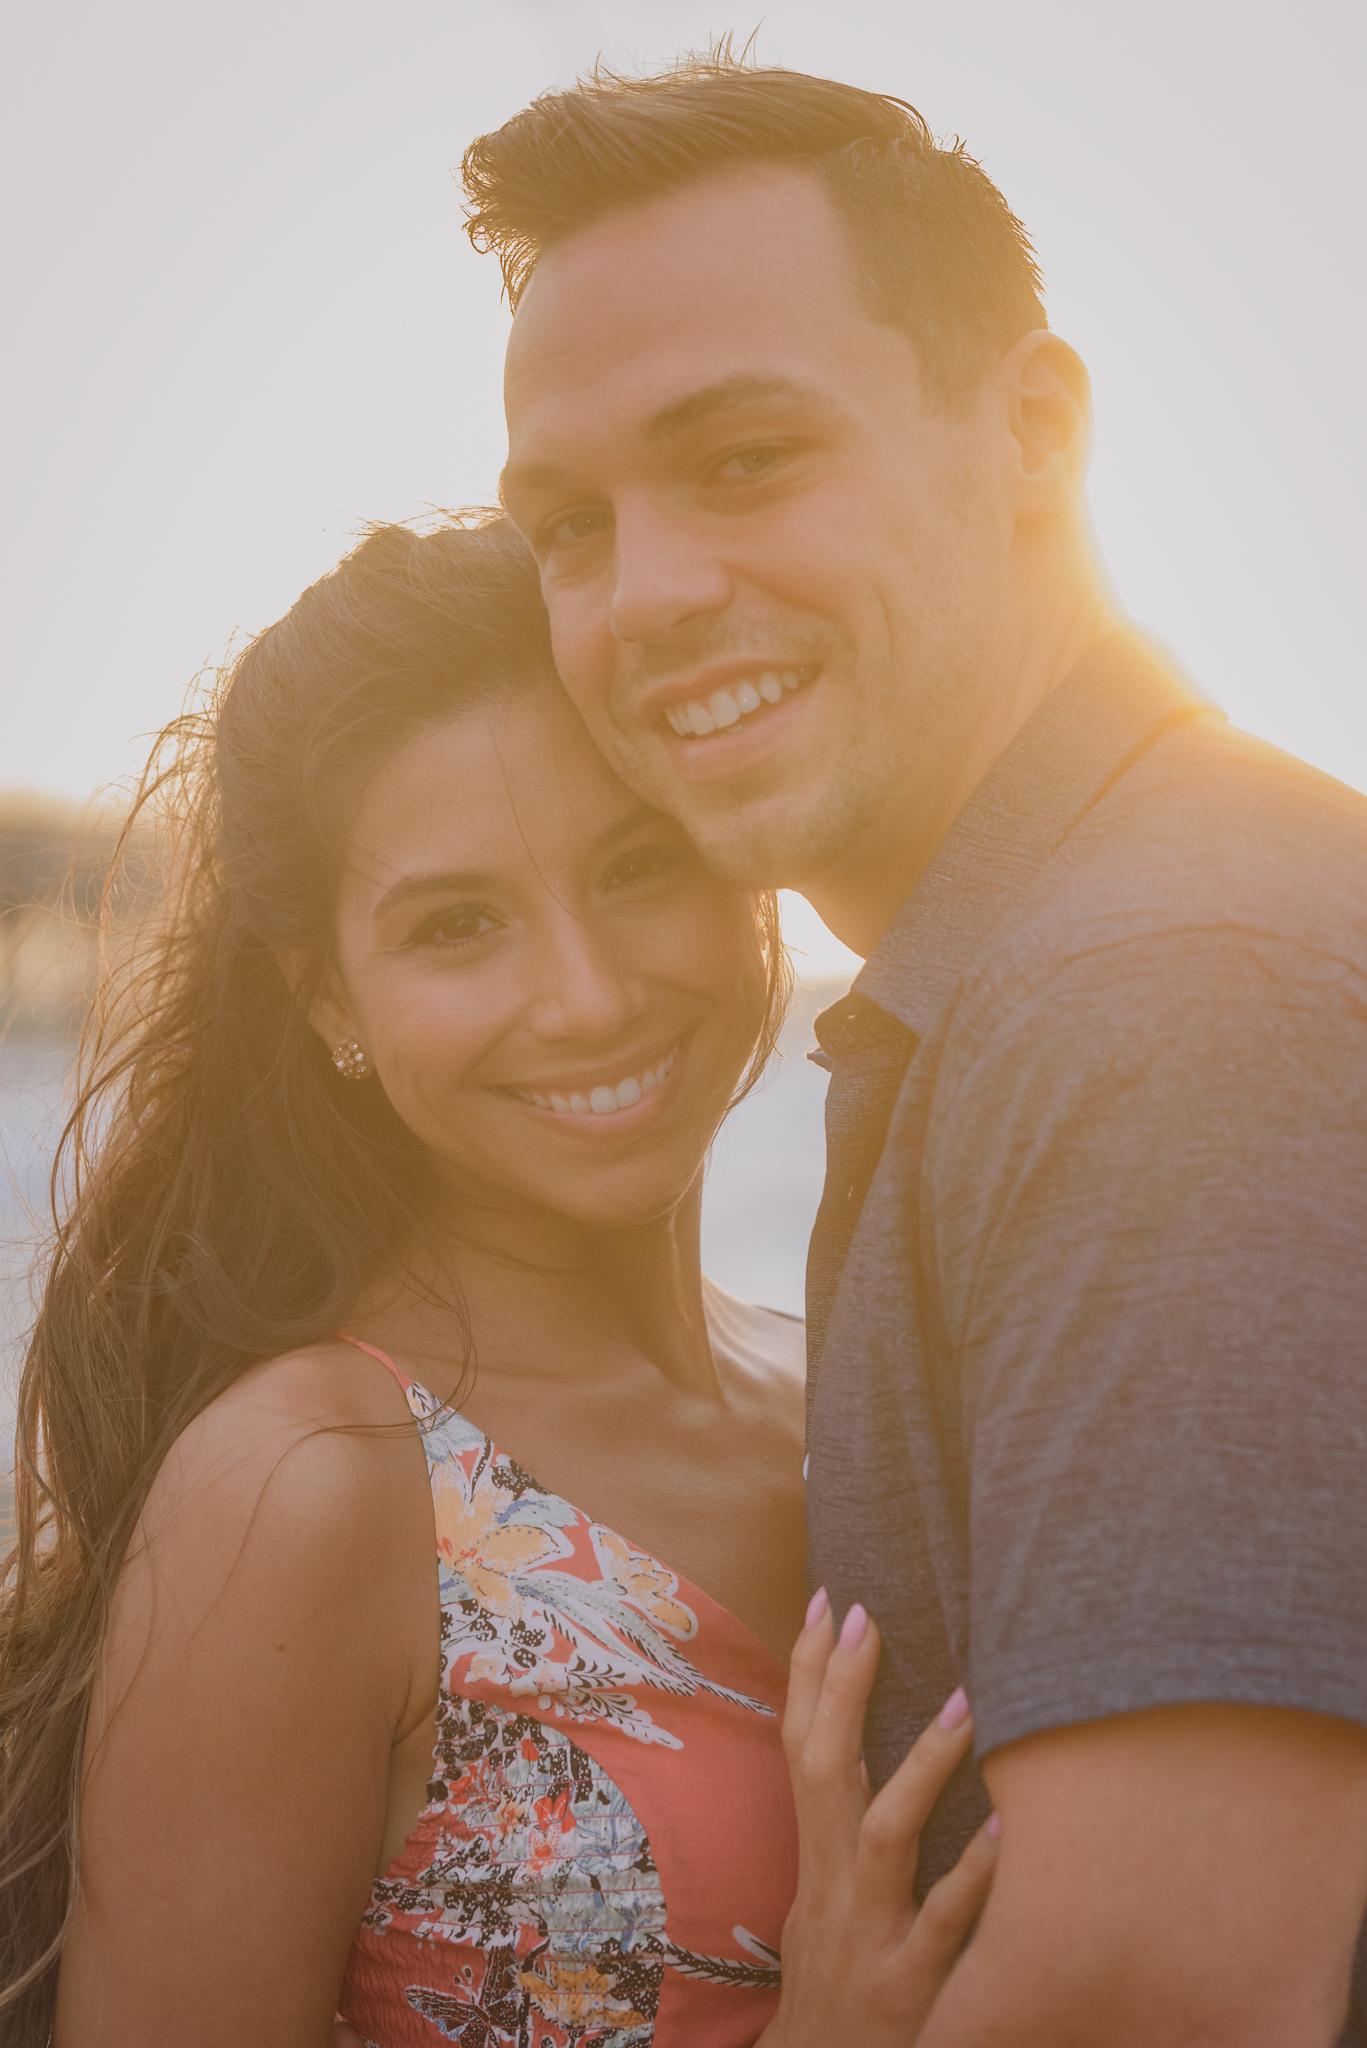 florida-beach-engagement-vanessa-and-johnny-photography-video-1-29.jpg